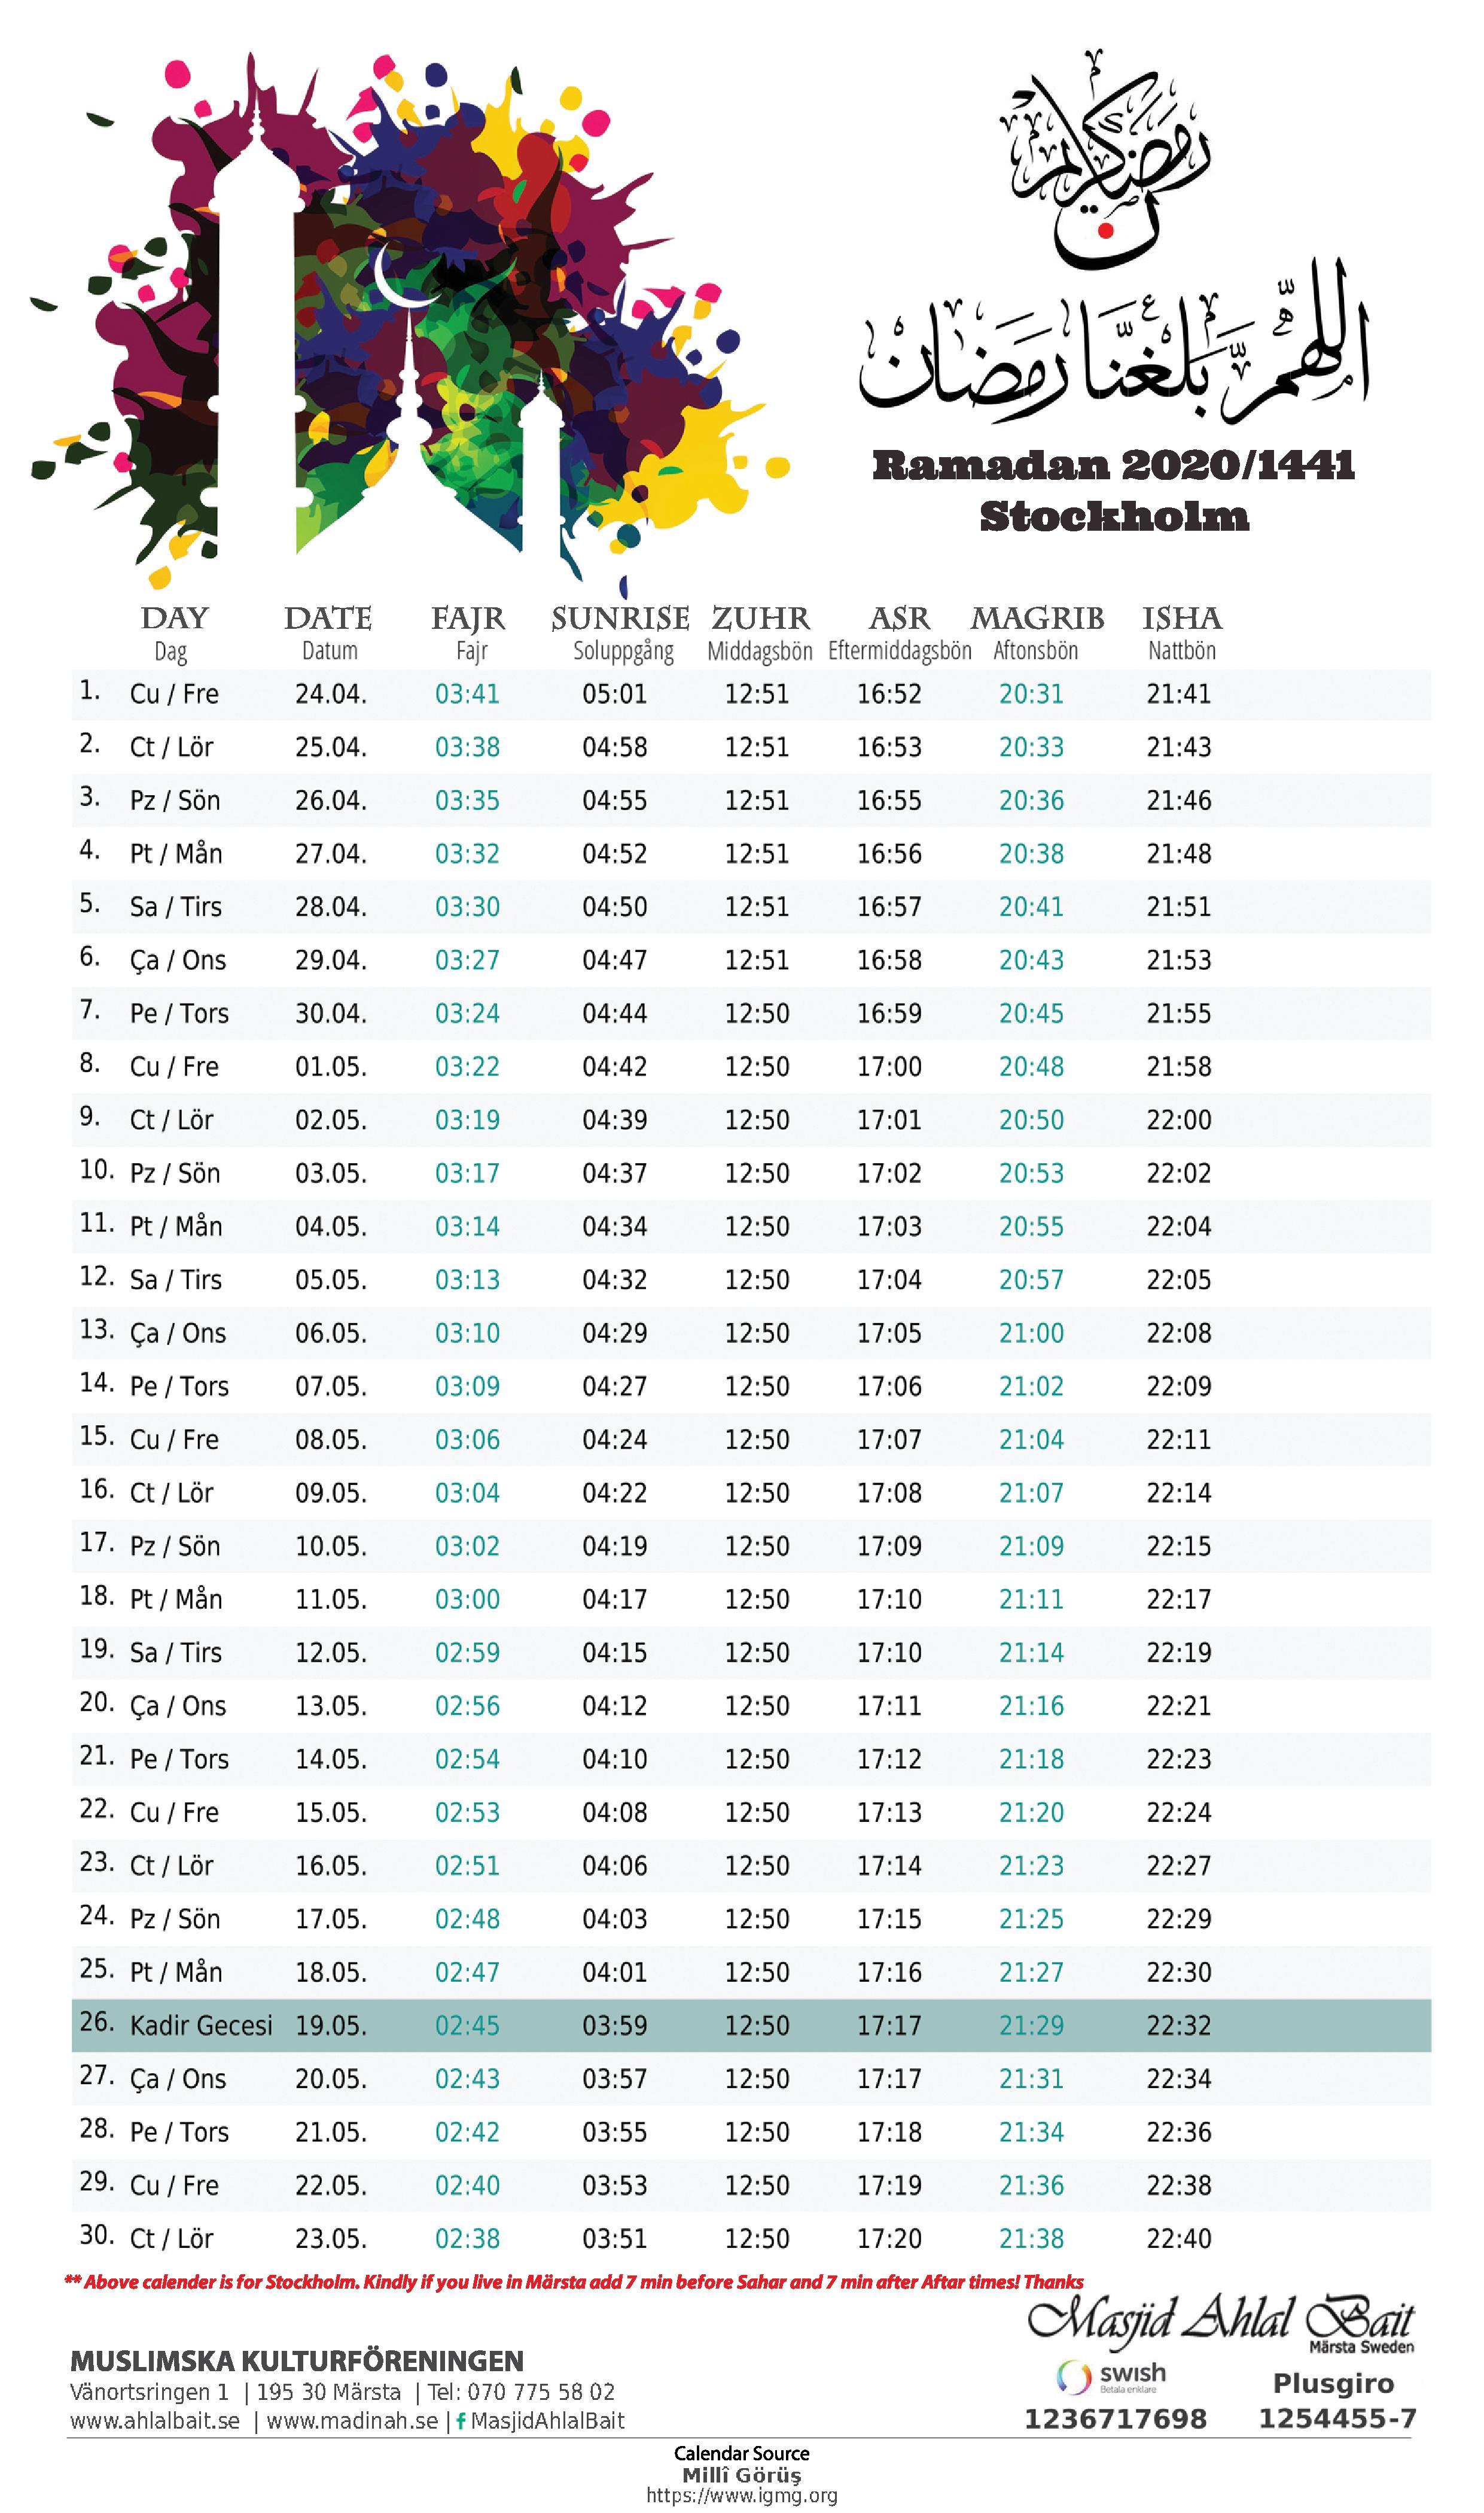 Ramzan timetable